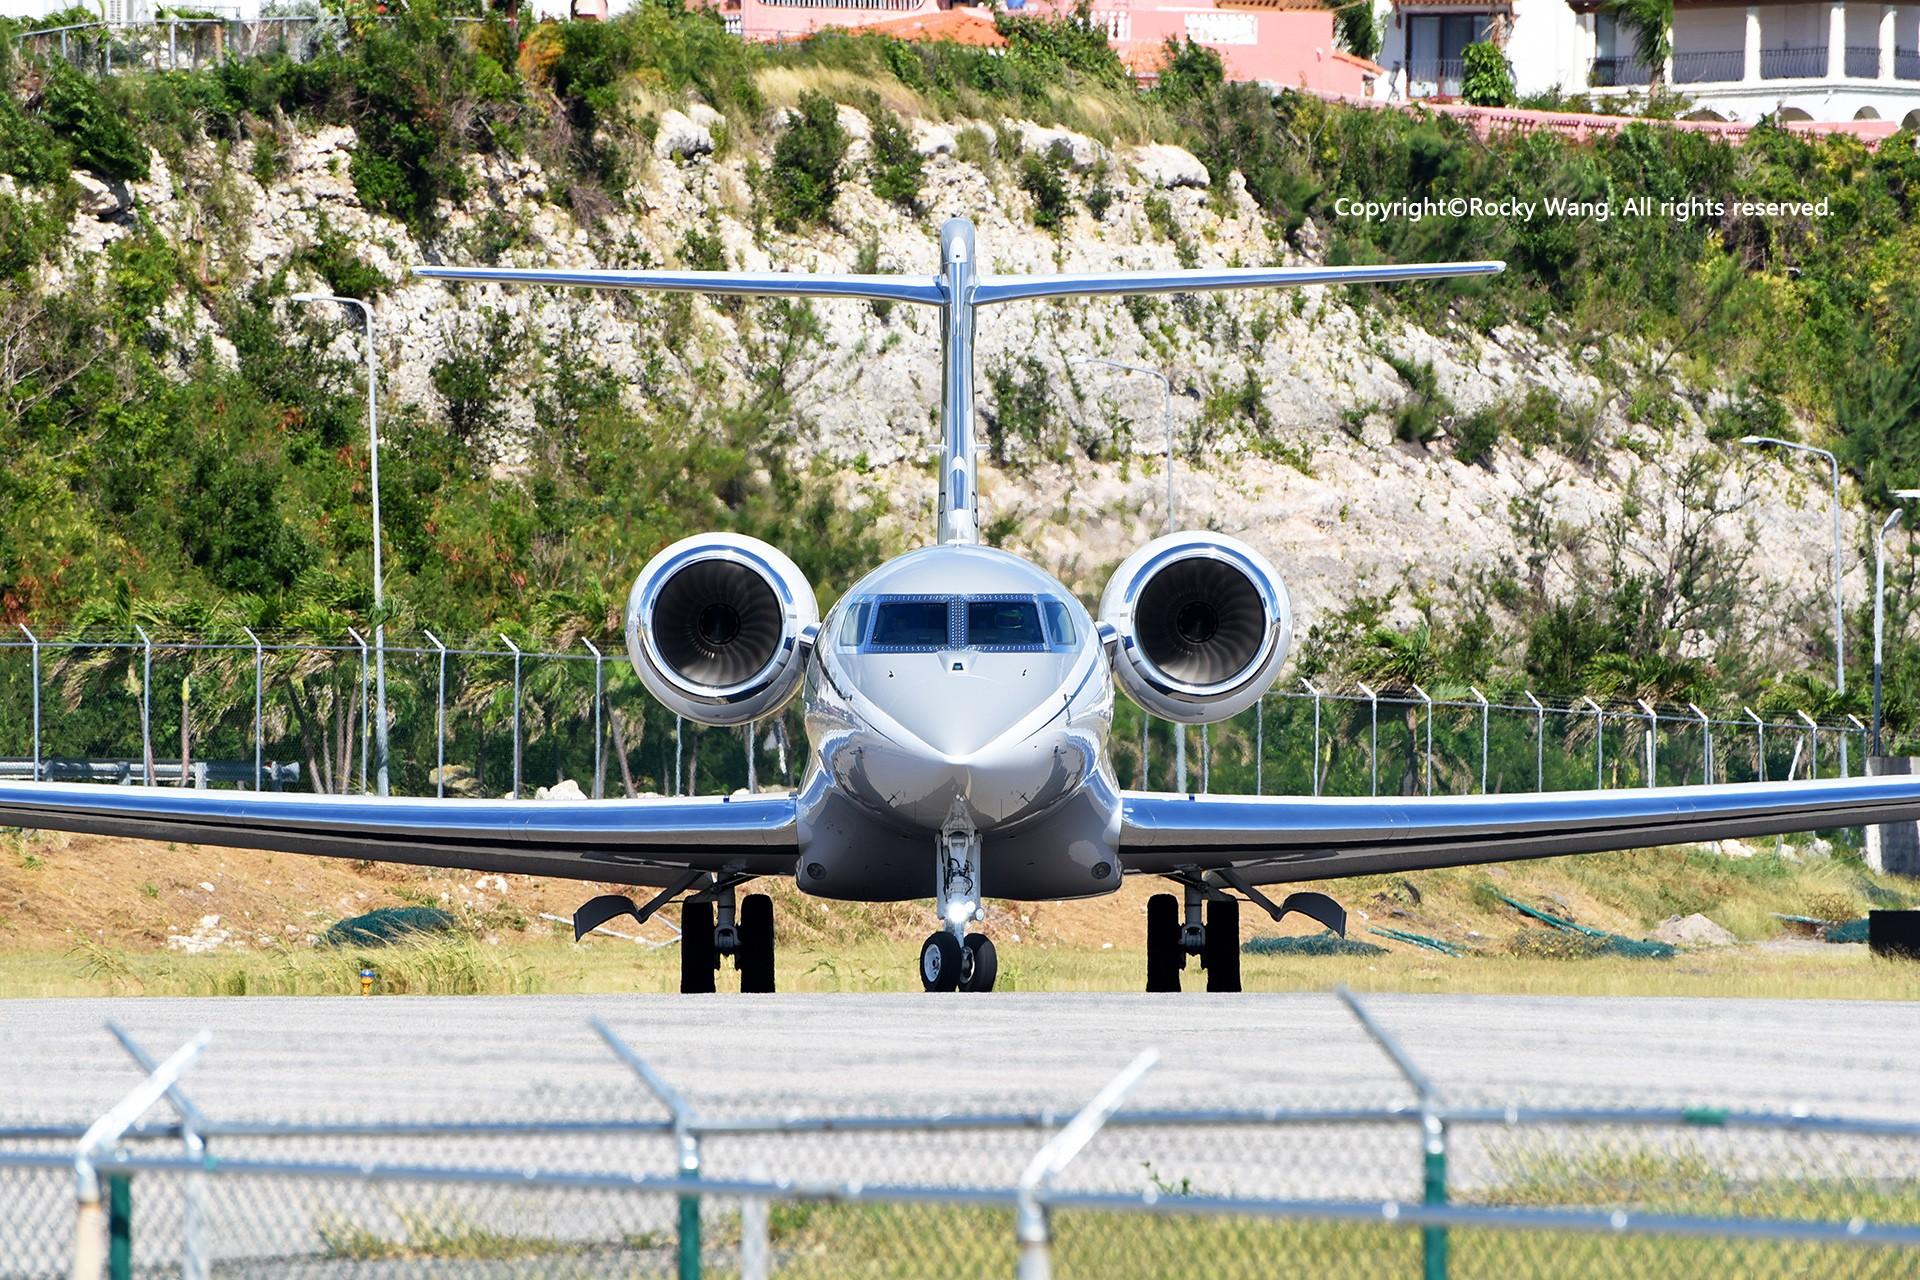 Re:[原创]My endless Caribbean dream——圣马丁朱莉安娜公主机场拍机记 GULFSTREAM G650ER C-FYRC 荷属安的列斯群岛朱利安娜公主机场